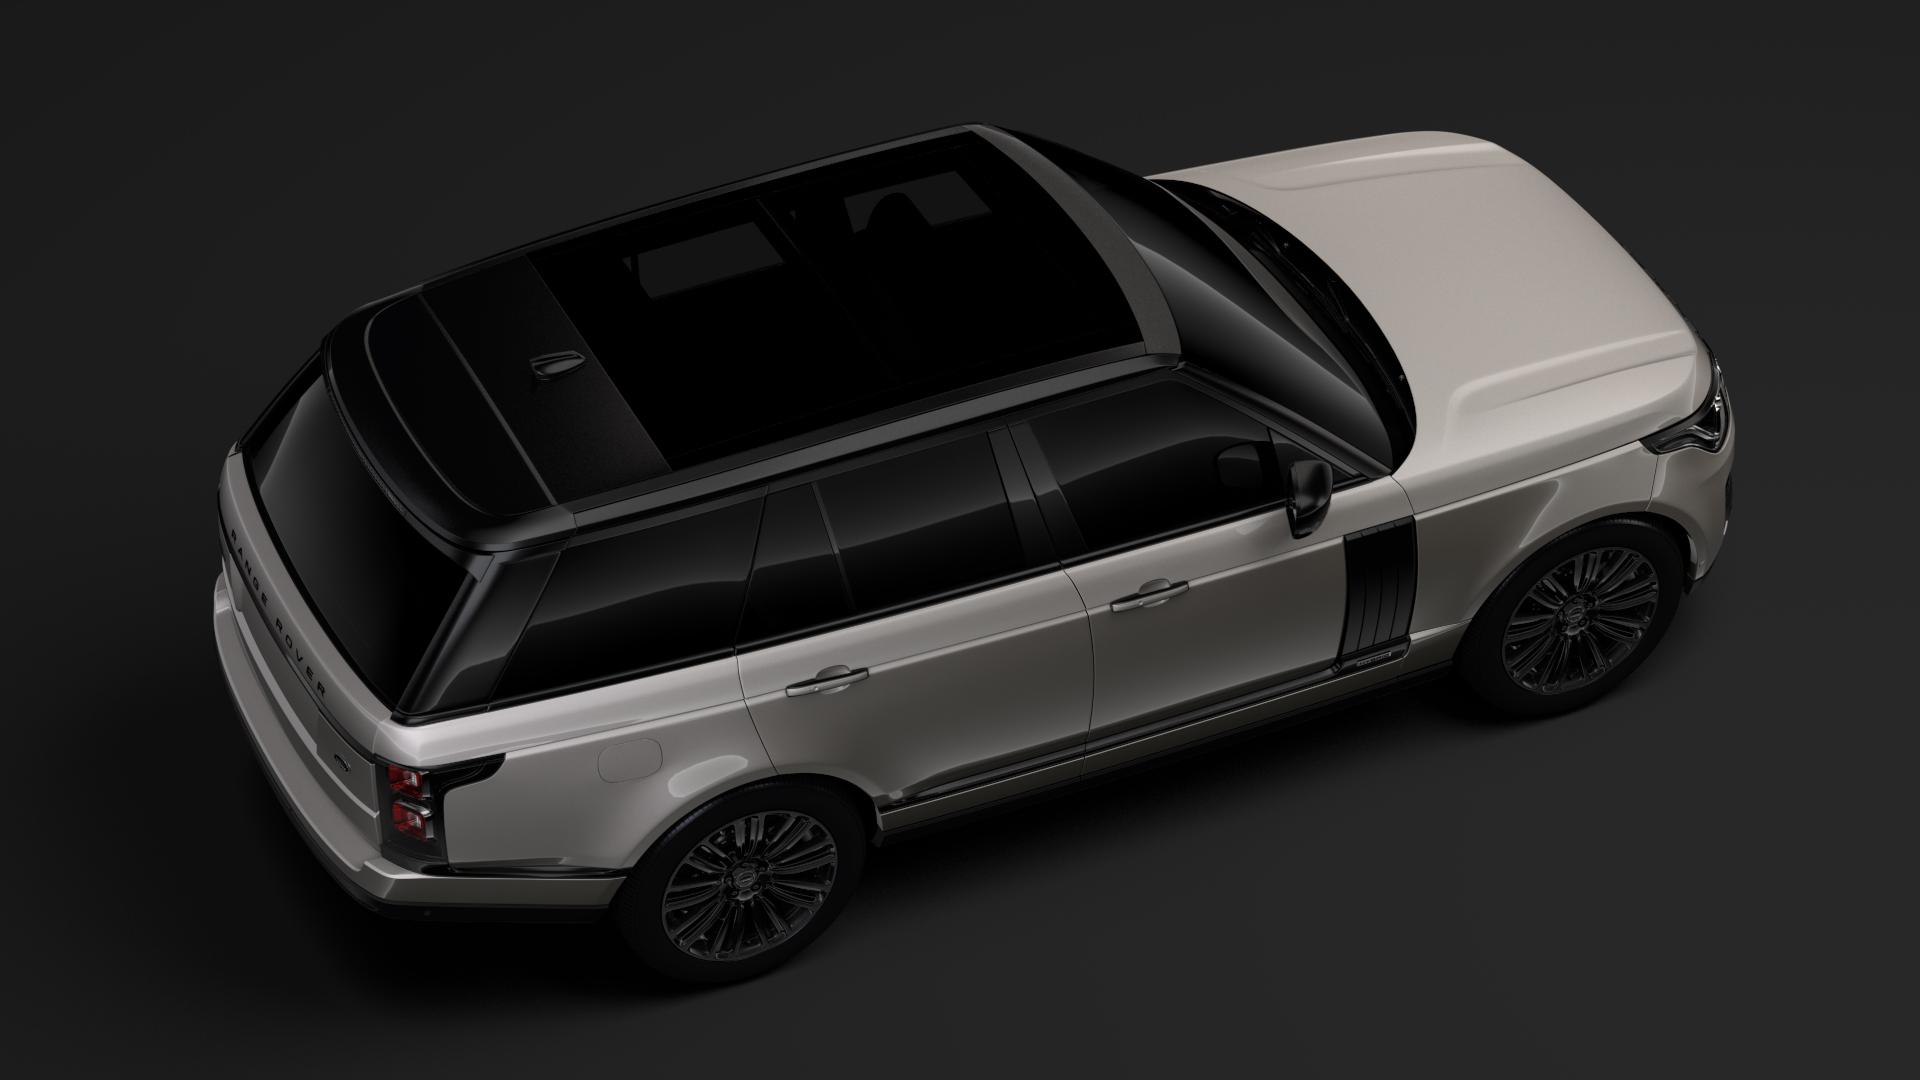 range rover autobiography hybrid (l405) 2018 3d model max fbx c4d lwo ma mb hrc xsi obj 278152